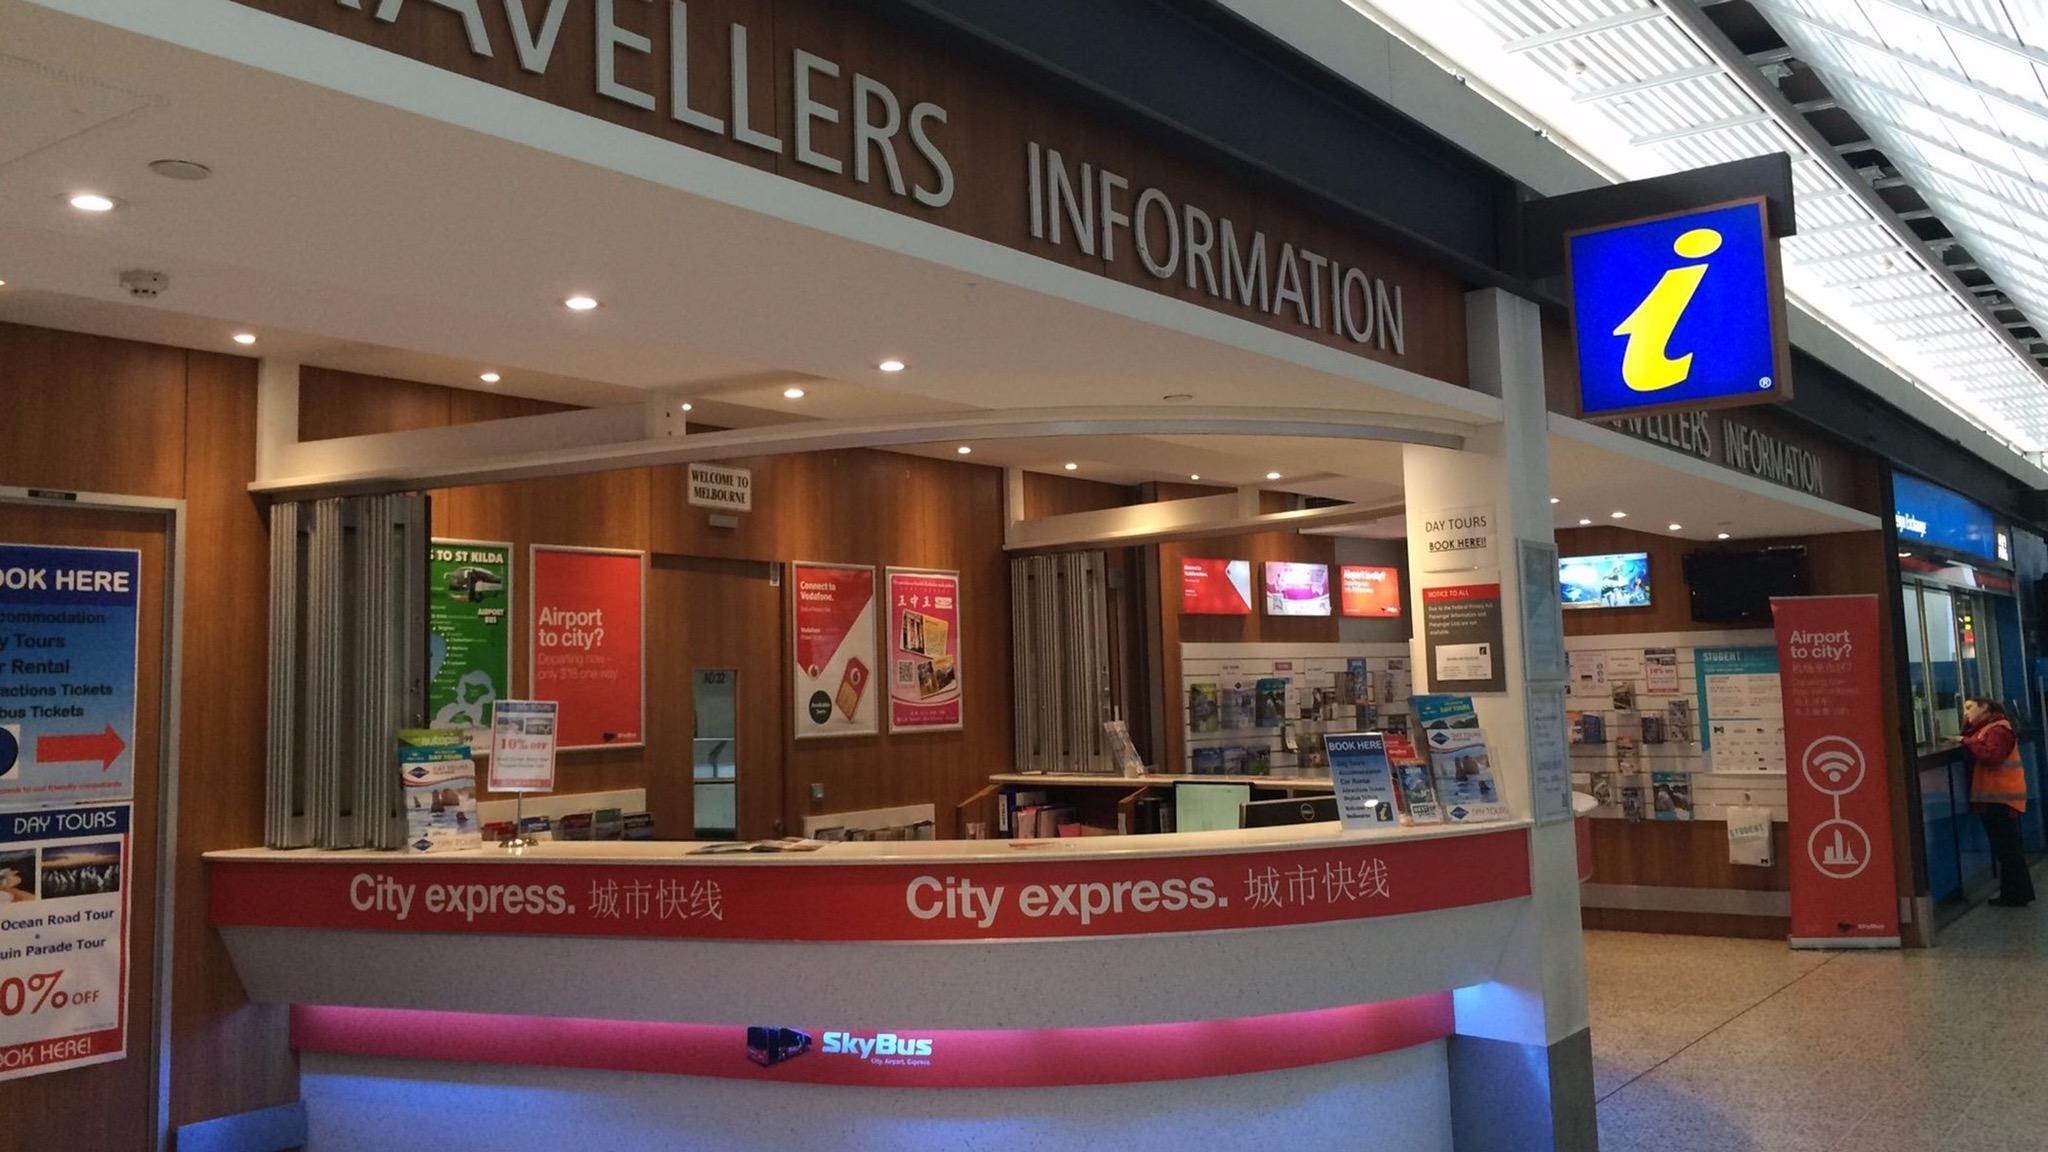 Melbourne Airport Visitor Information Centre